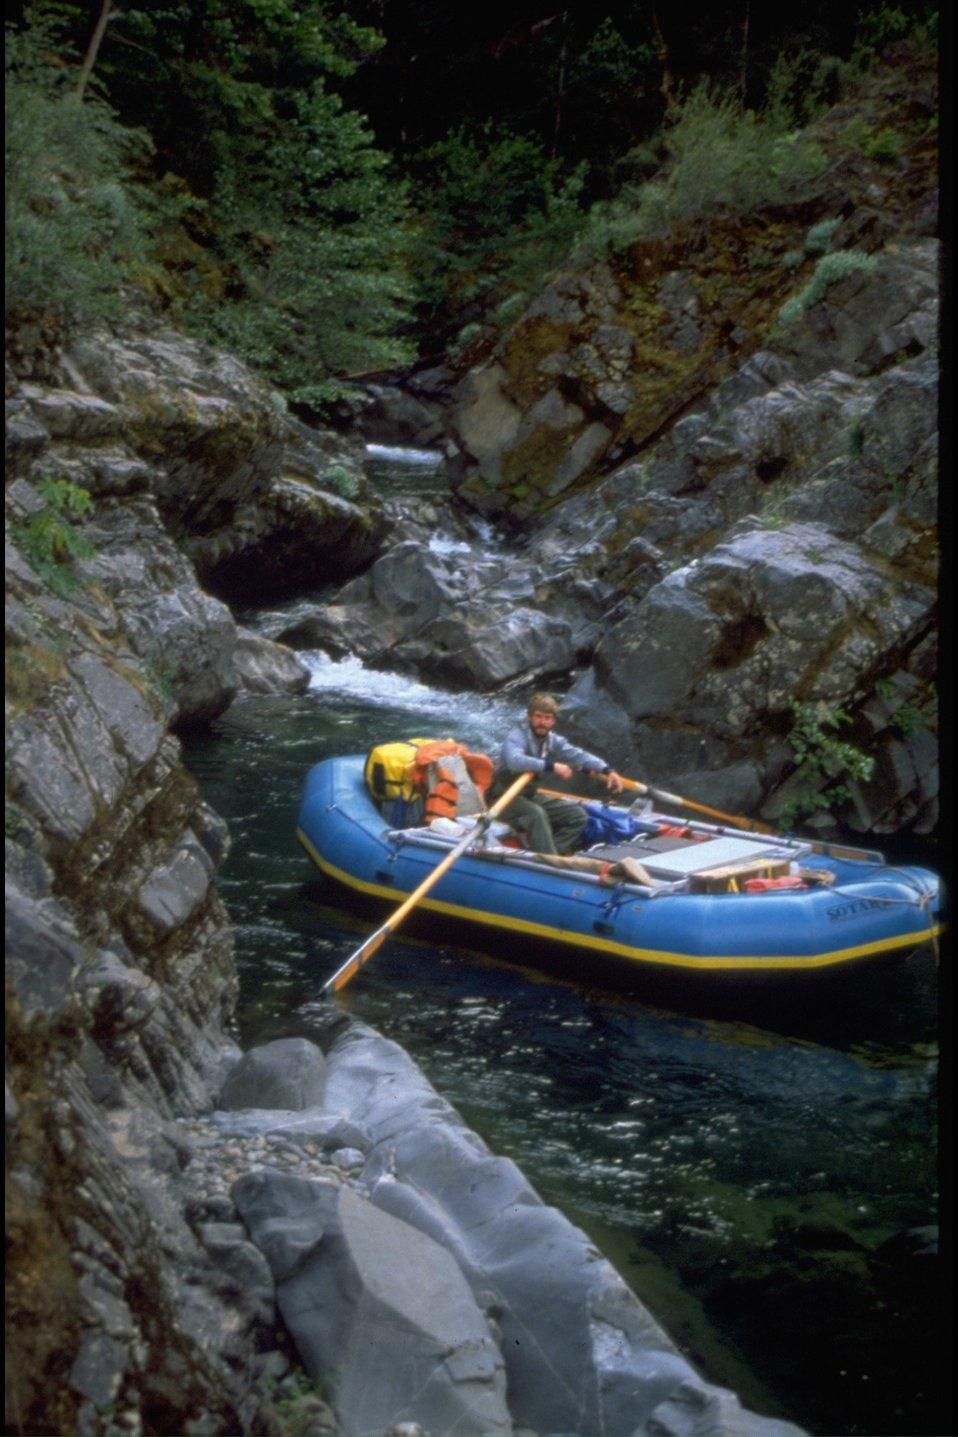 Rafting at Big Windy Creek (8,000 cfs).